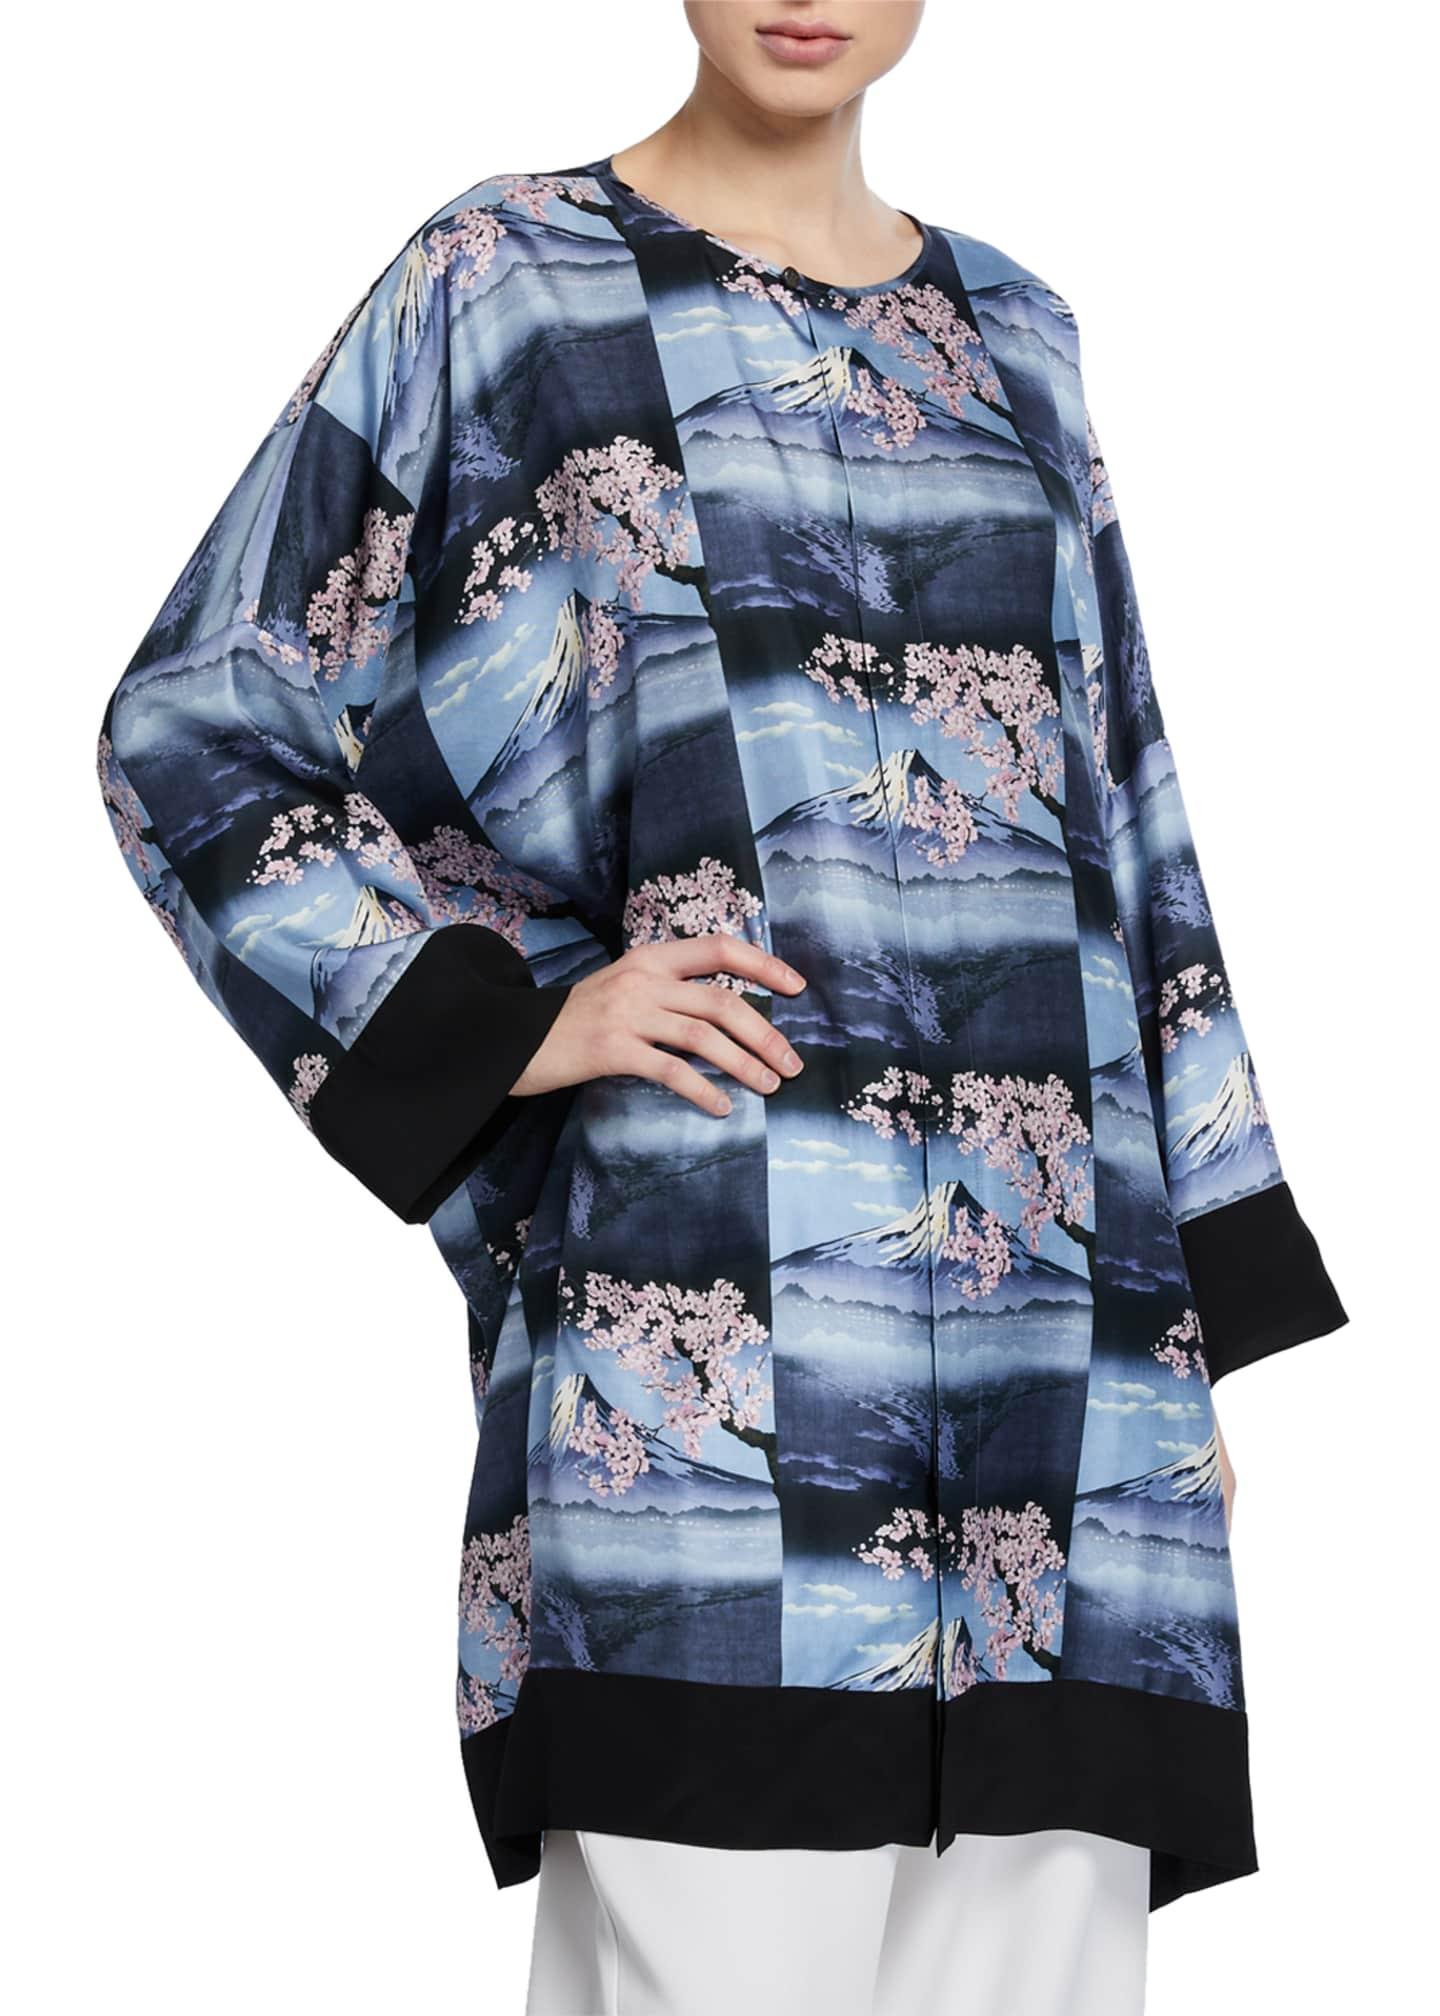 Eskandar Mount Fuji Repeated-Print Bound Neck Shirt